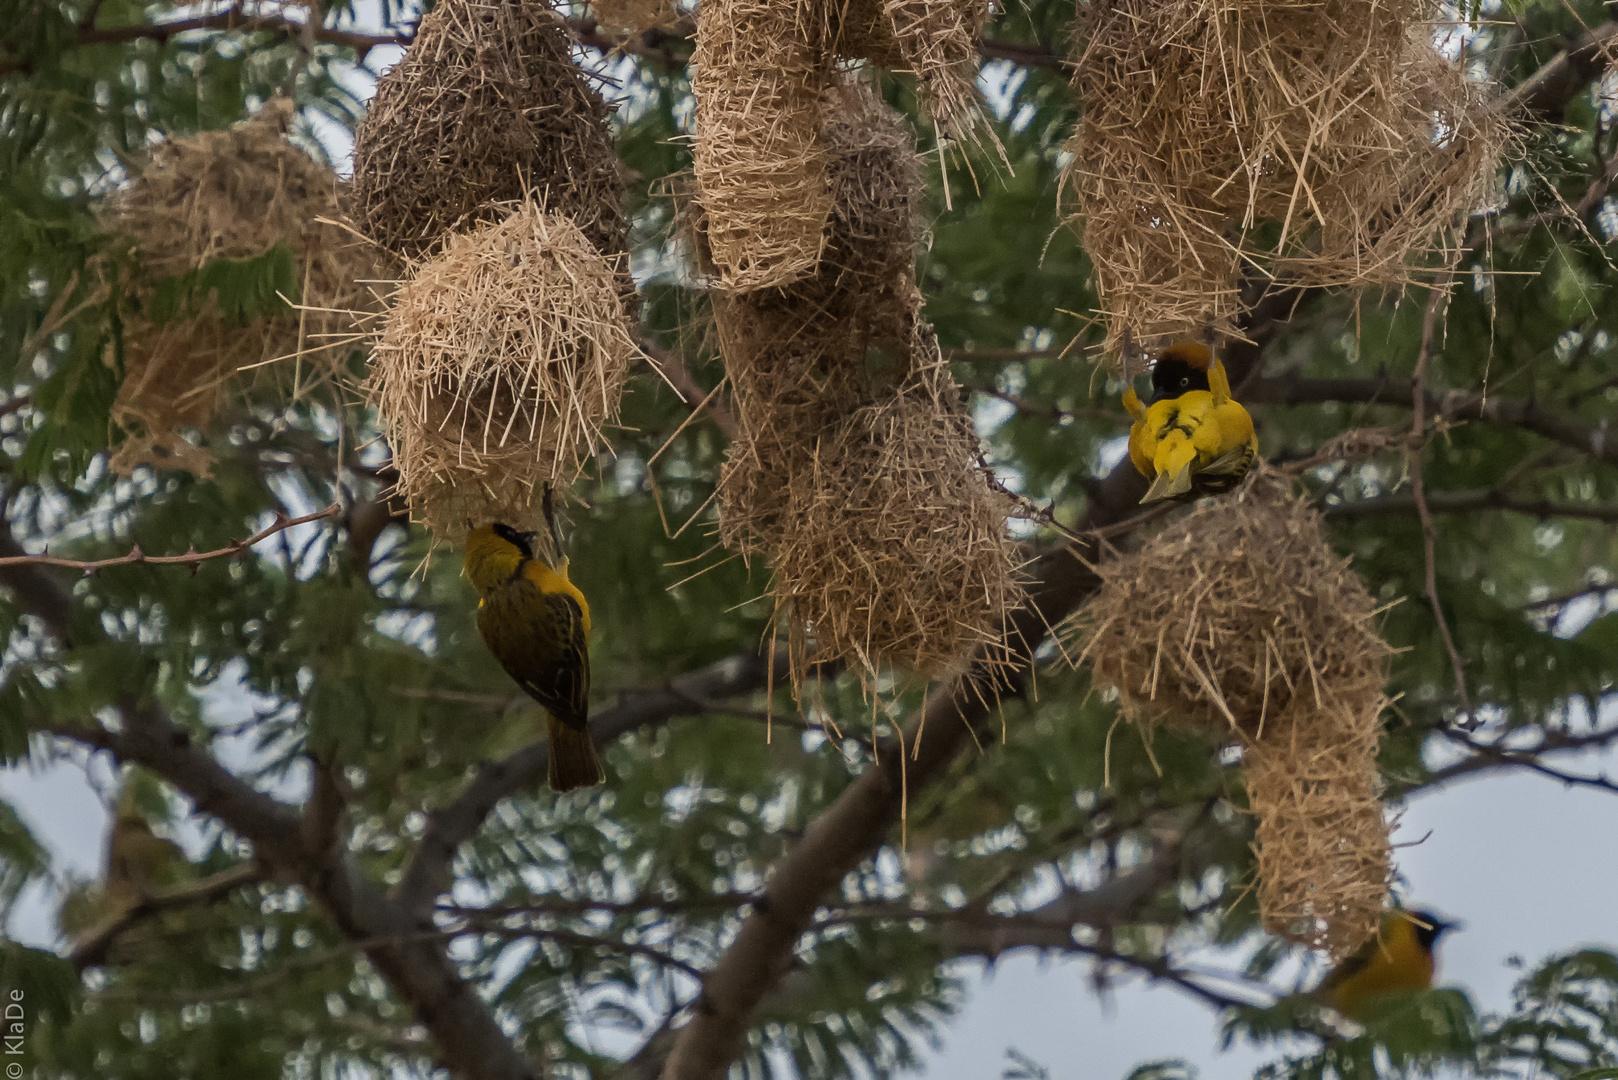 Tansania - Serengeti - Webervögel beim Nestbau